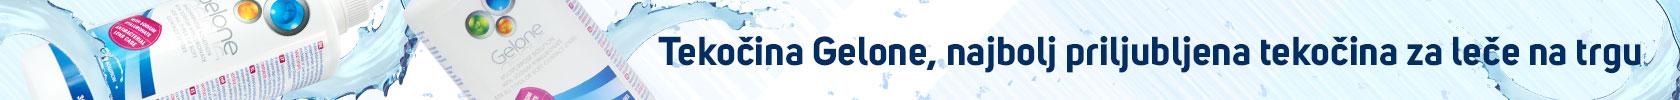 Tekočina Gelone